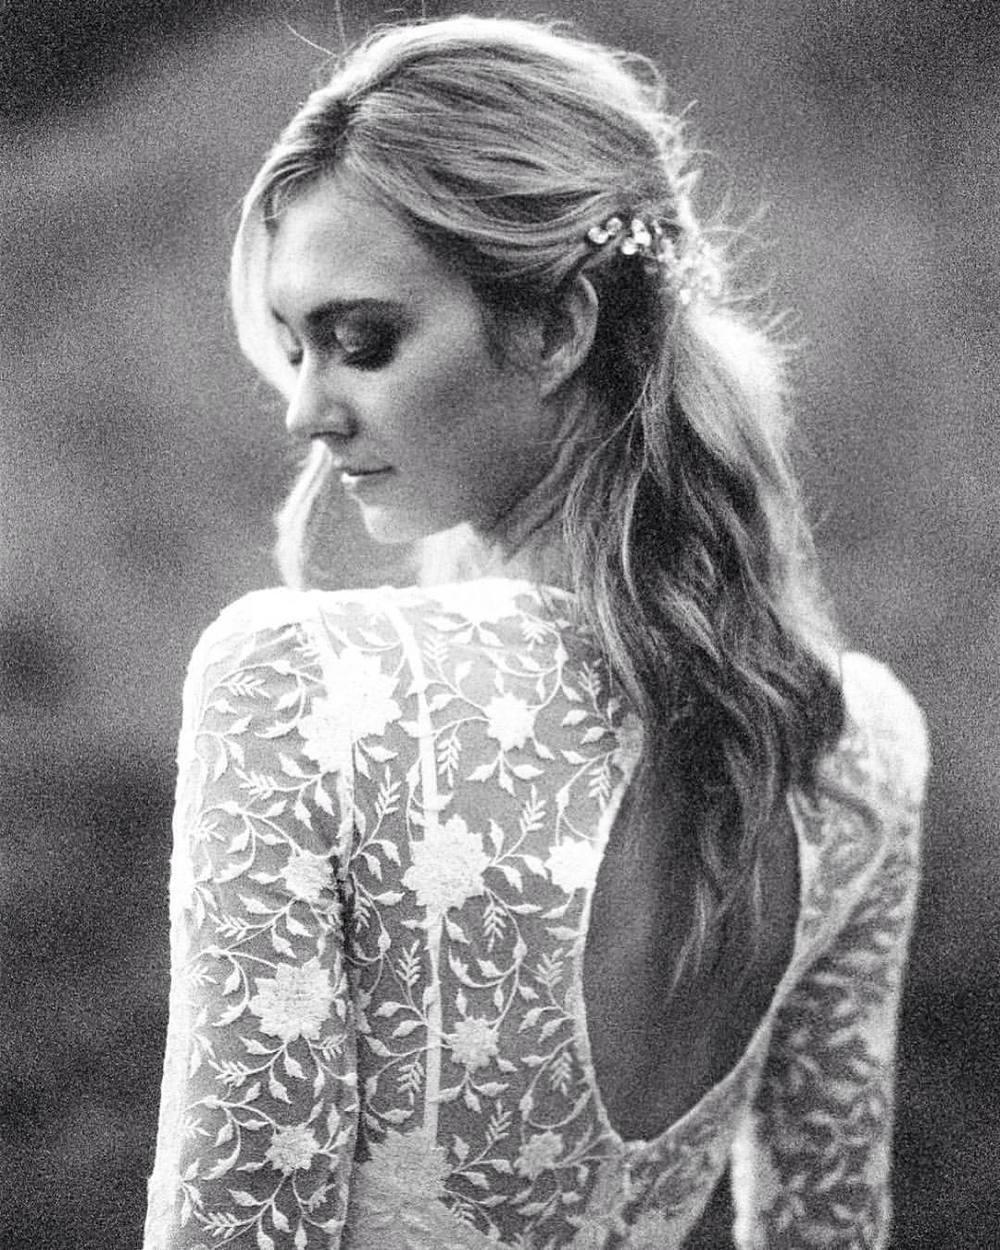 Ohhh what a glorious black and white shot by @tamaragrunerphotography and @parkfloraldesign ✨✨✨✨ love the black and white capture of my gown… And love keyhole backs;) #tatyanamerenyuk #tatyanamerenyukbridal #whimsy #fashion #style #stylish #cute #tatyanamerenyukbridal #hair #beauty #beautiful #pretty #design #bridaldress #dress #wedding #weddingdress #bohochick #boho #whitedress #weddinginsporation #lace #о#bride #nycdesigner #brooklyndesigner #bridal #brooklynbride